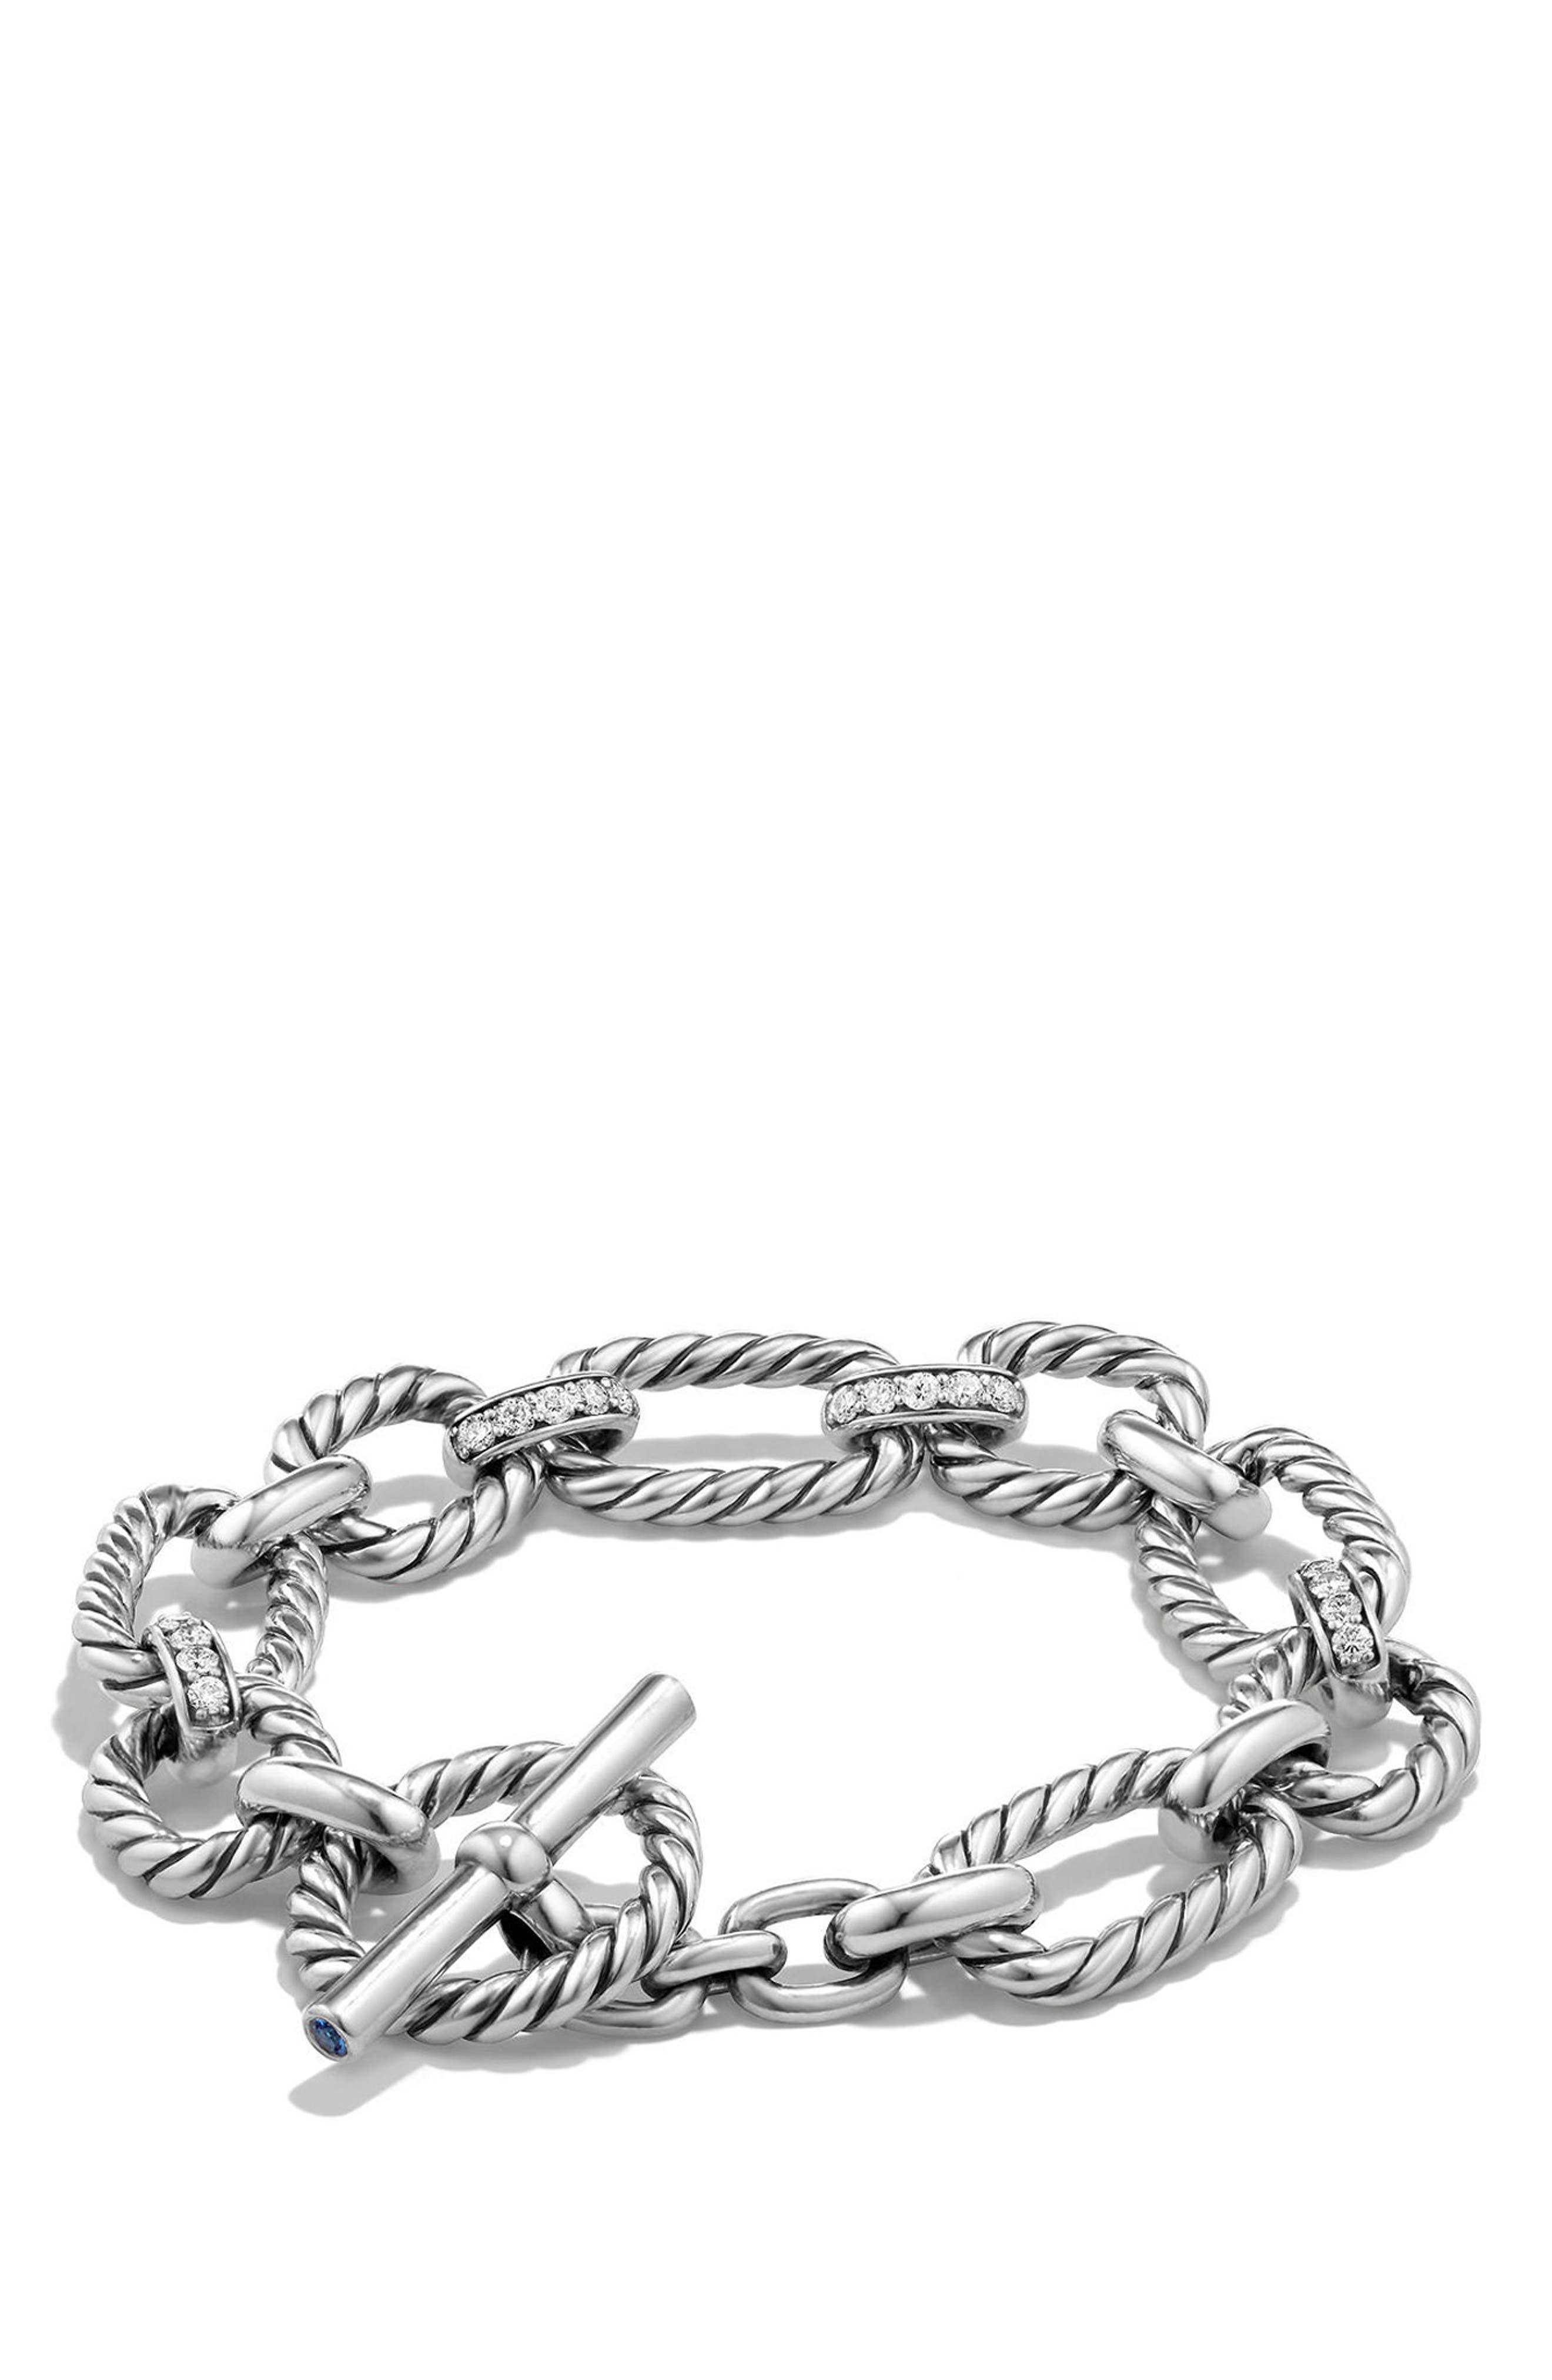 'Chain' Cushion Link Bracelet with Diamonds,                         Main,                         color, SILVER